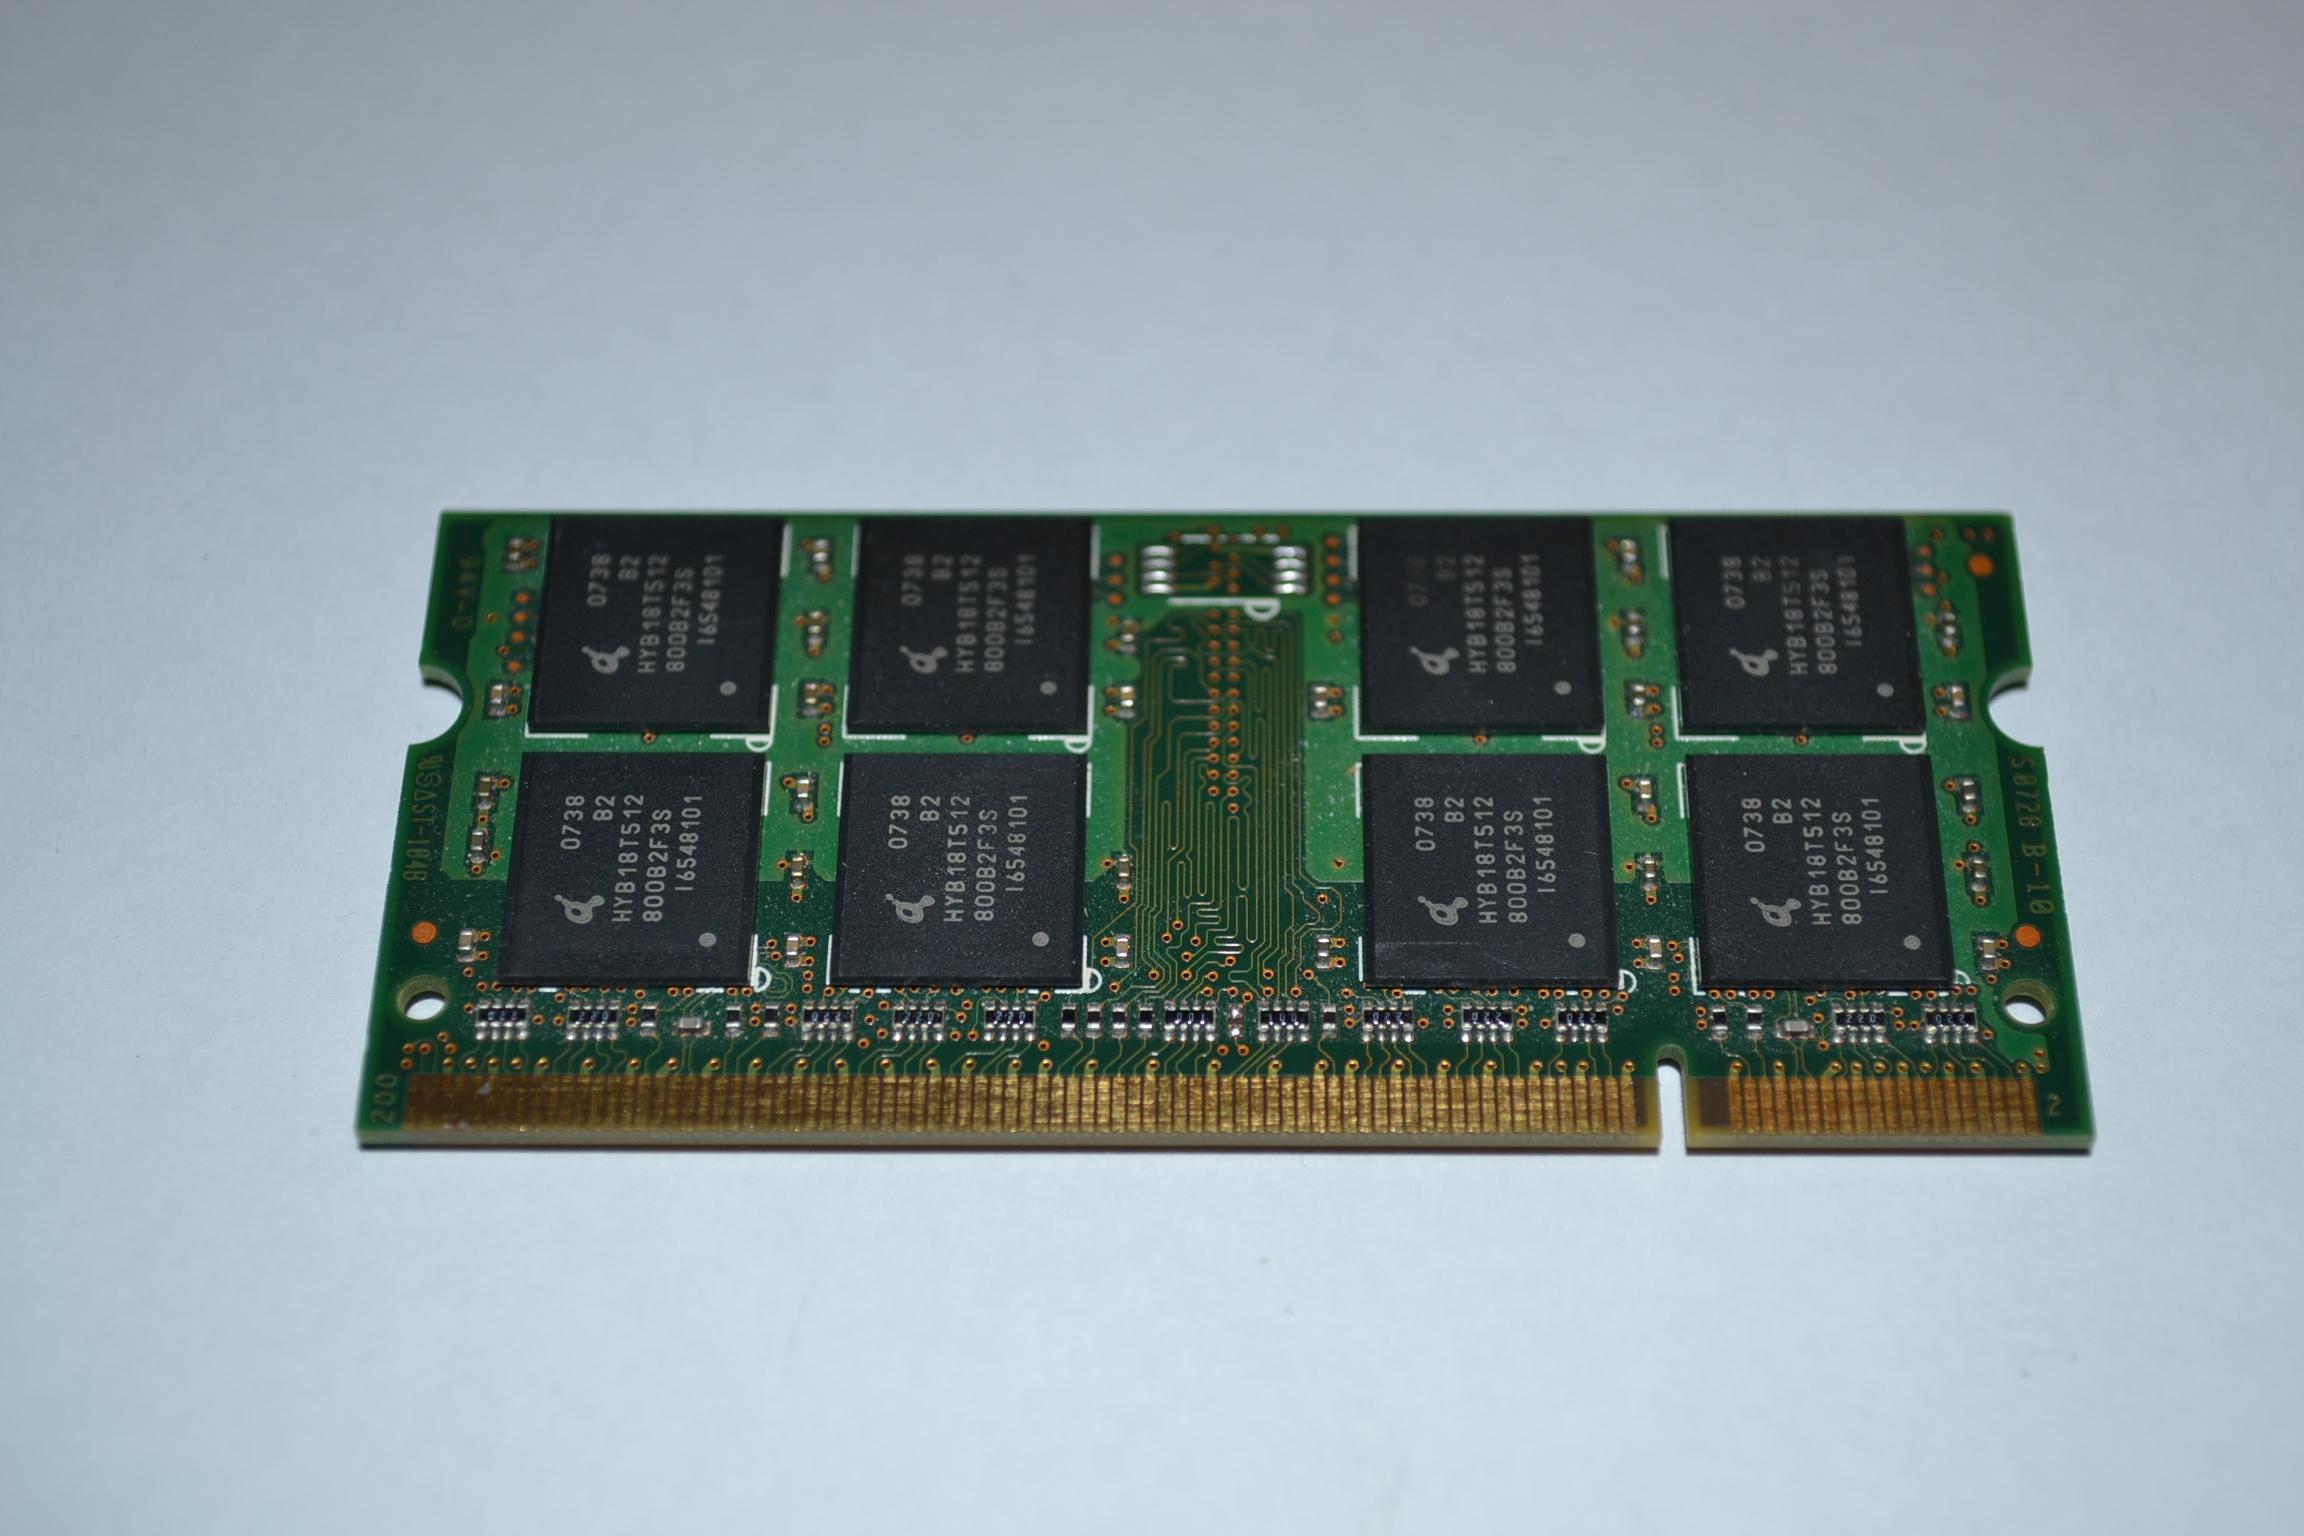 Samsung Memory 512MB PC24200S M470T6554EZ3CD5 DDR2 SDRAM